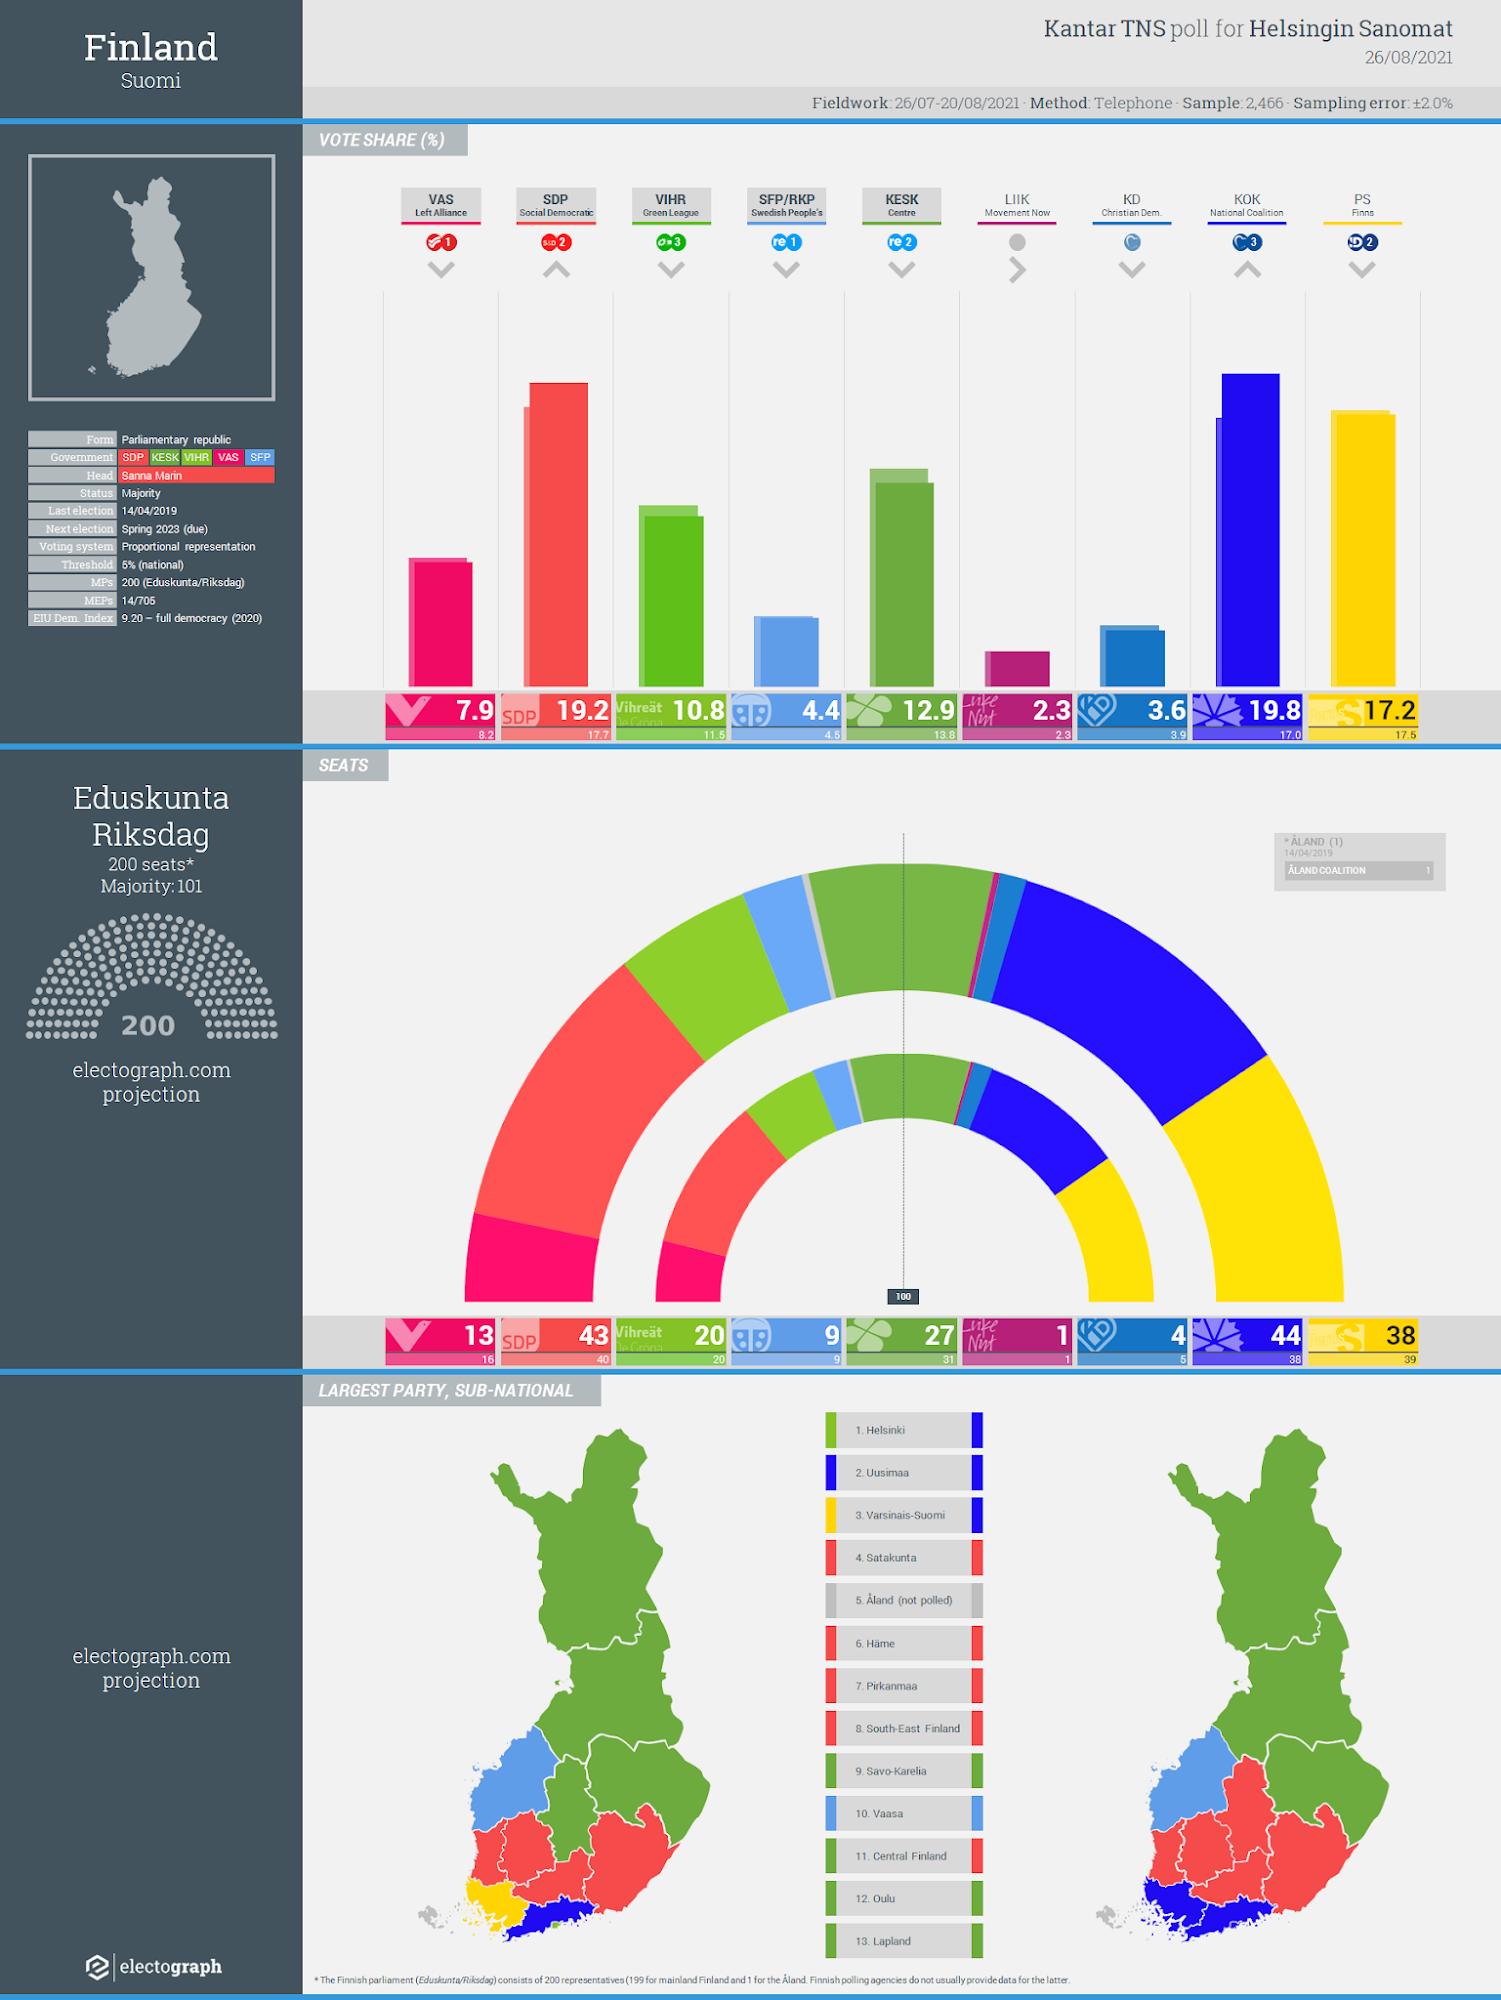 FINLAND: Kantar TNS poll chart for Helsingin Sanomat, 26 August 2021